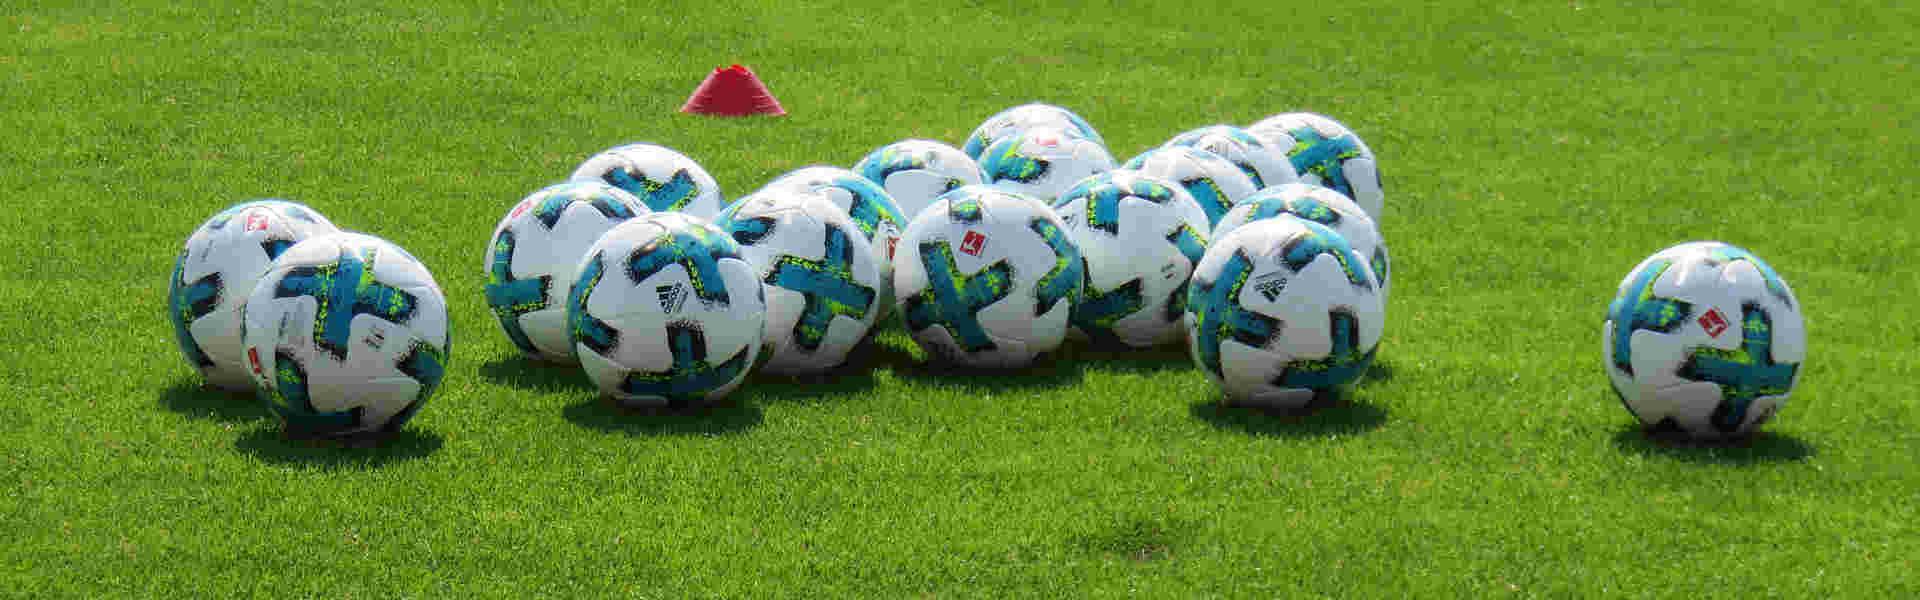 Fussball Ergebnisse Tsv Burghaslach